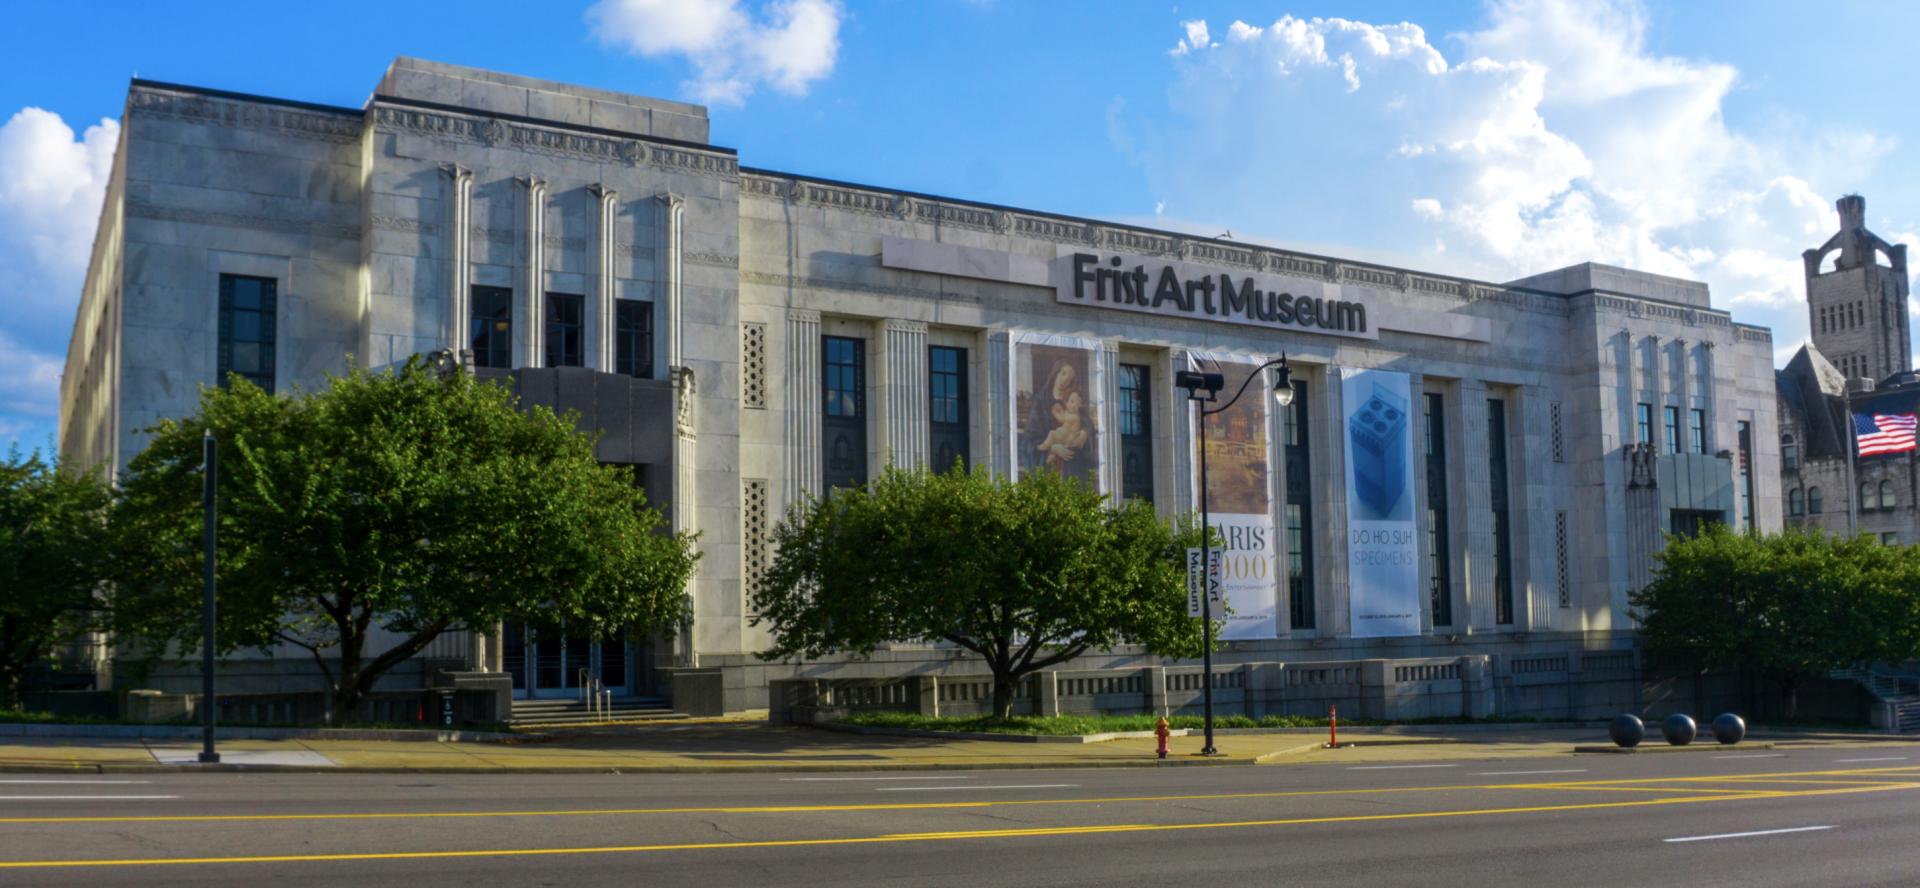 Frist Art Museum Nashville Tennesee